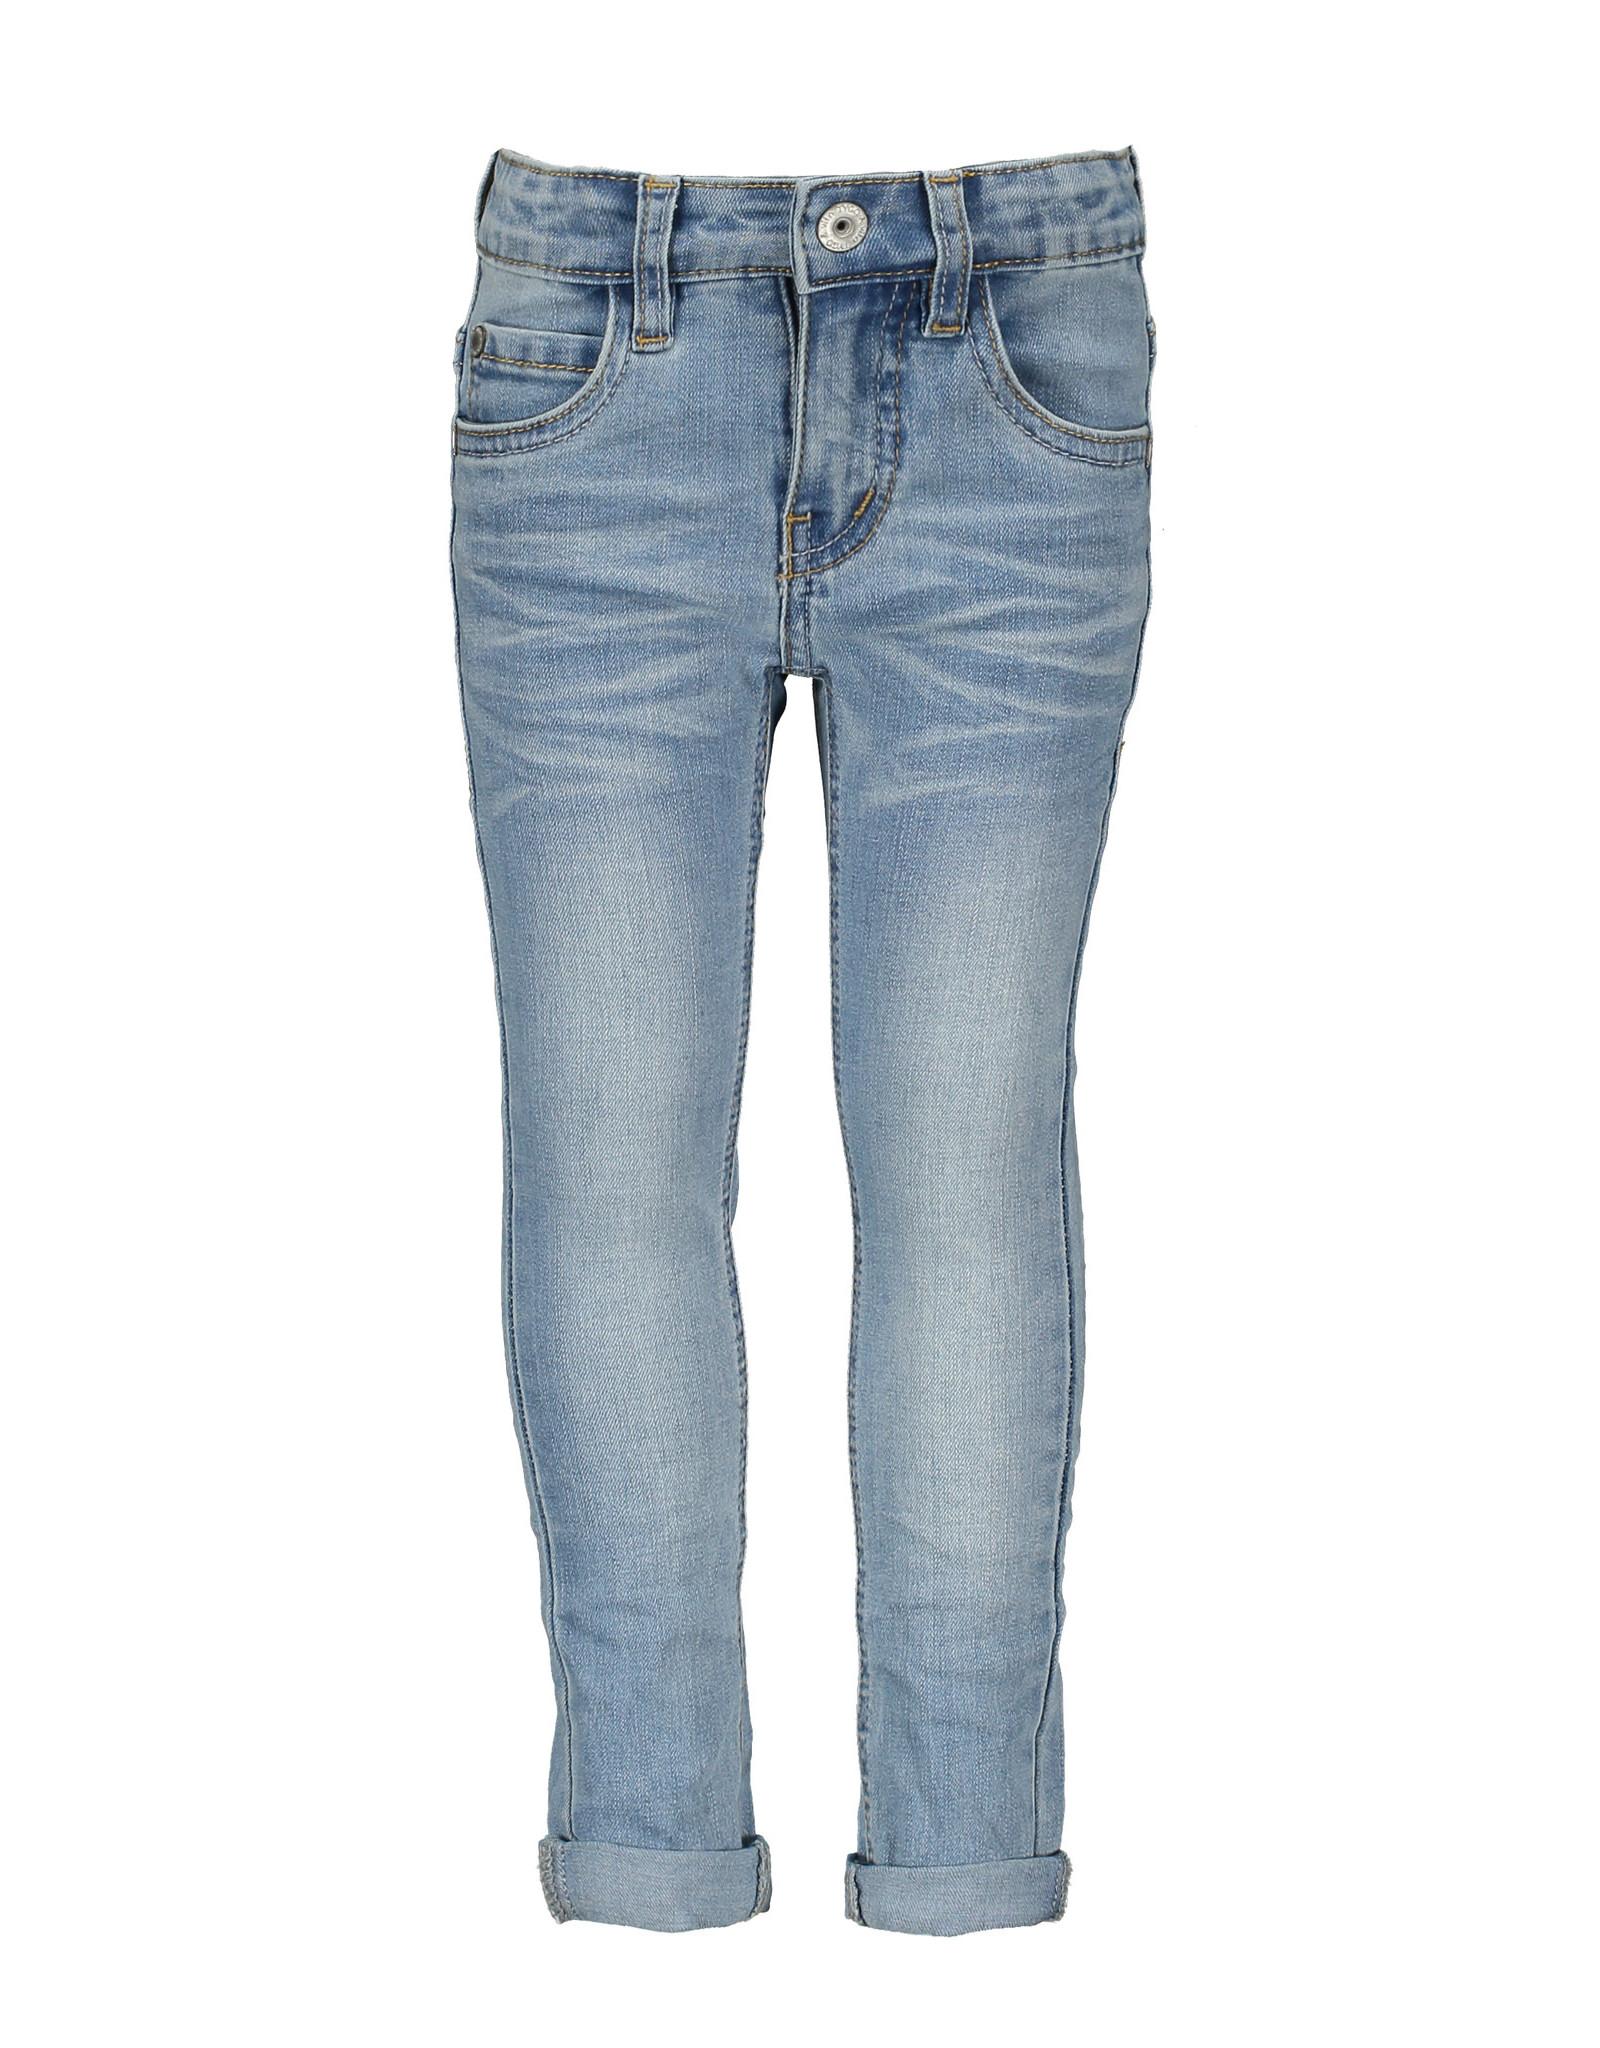 Tygo & vito Jeans Skinny stretch jeans 801 L.Used NOS